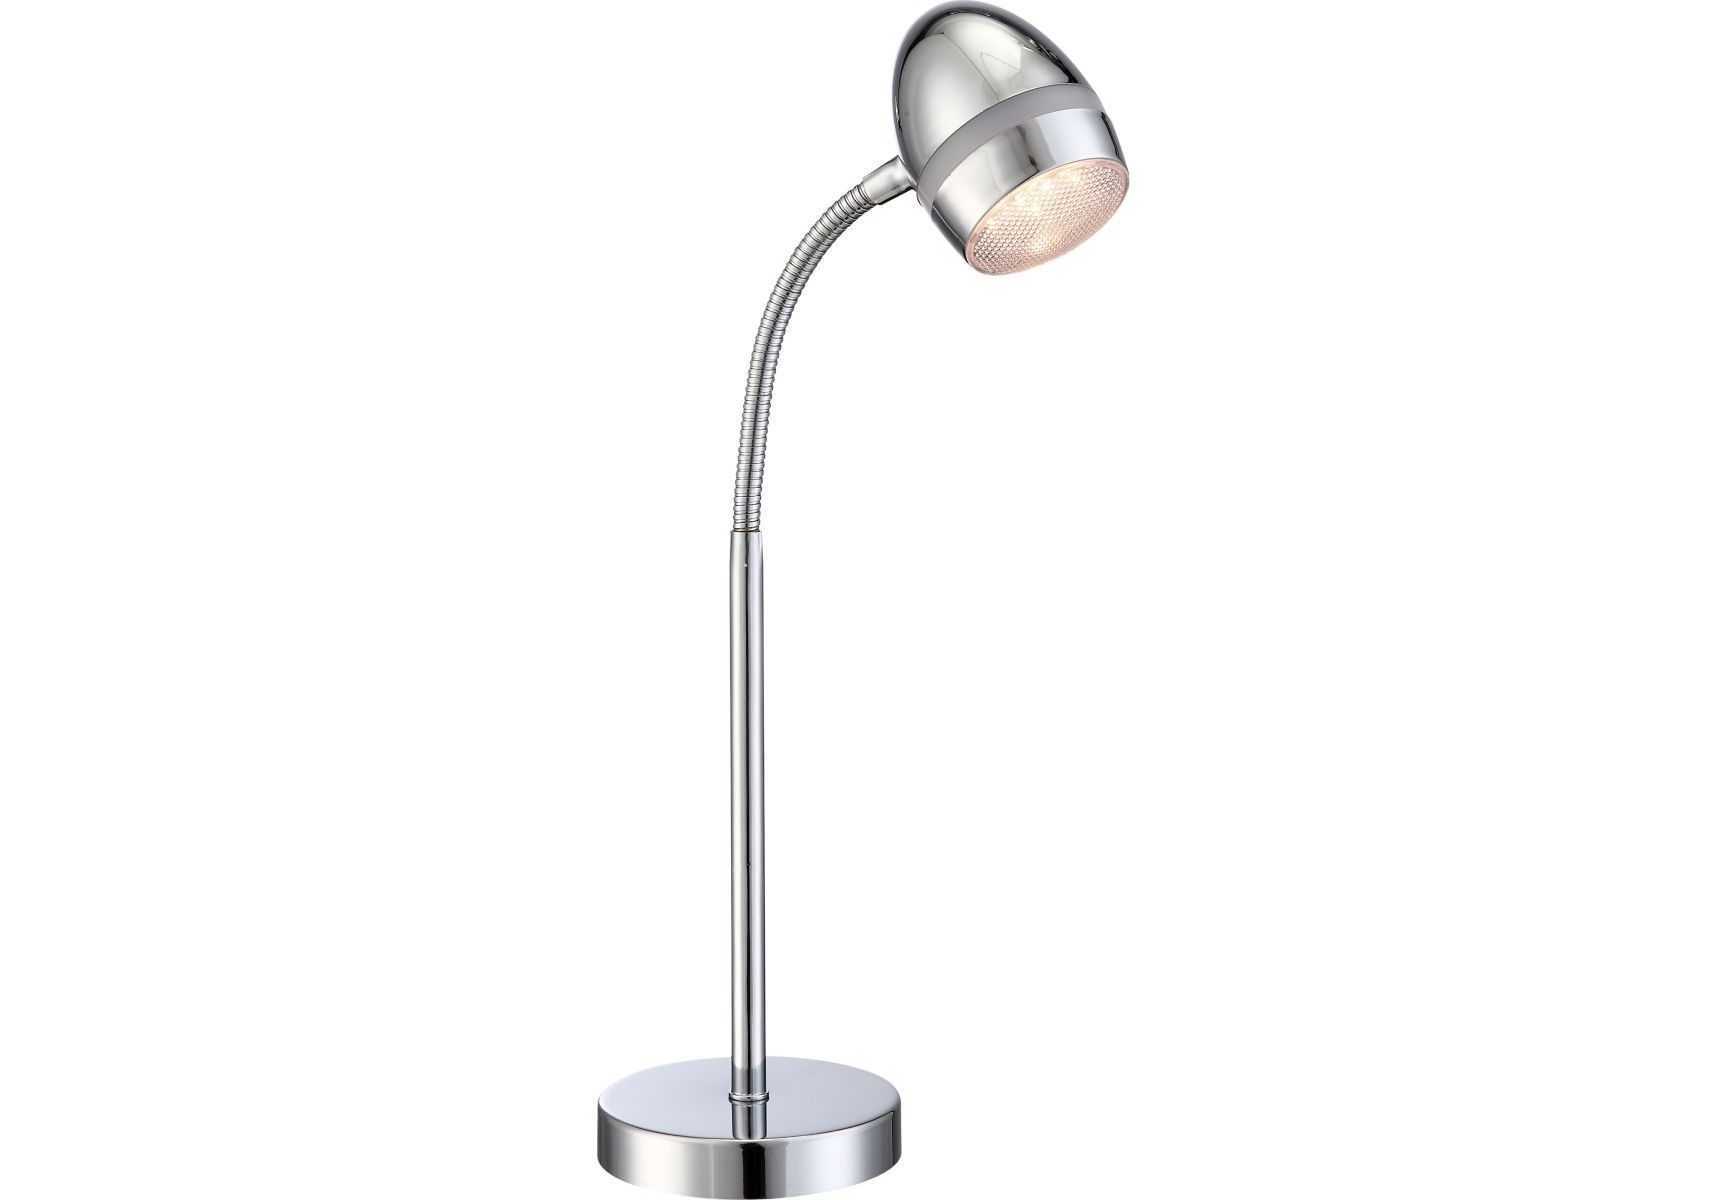 Настольная лампаНастольные лампы<br>&amp;lt;div&amp;gt;Цоколь: LED&amp;lt;/div&amp;gt;&amp;lt;div&amp;gt;Мощность: 3W&amp;lt;/div&amp;gt;&amp;lt;div&amp;gt;Количество ламп: 1&amp;lt;/div&amp;gt;<br><br>Material: Дерево<br>Width см: None<br>Height см: 43<br>Diameter см: 25,5